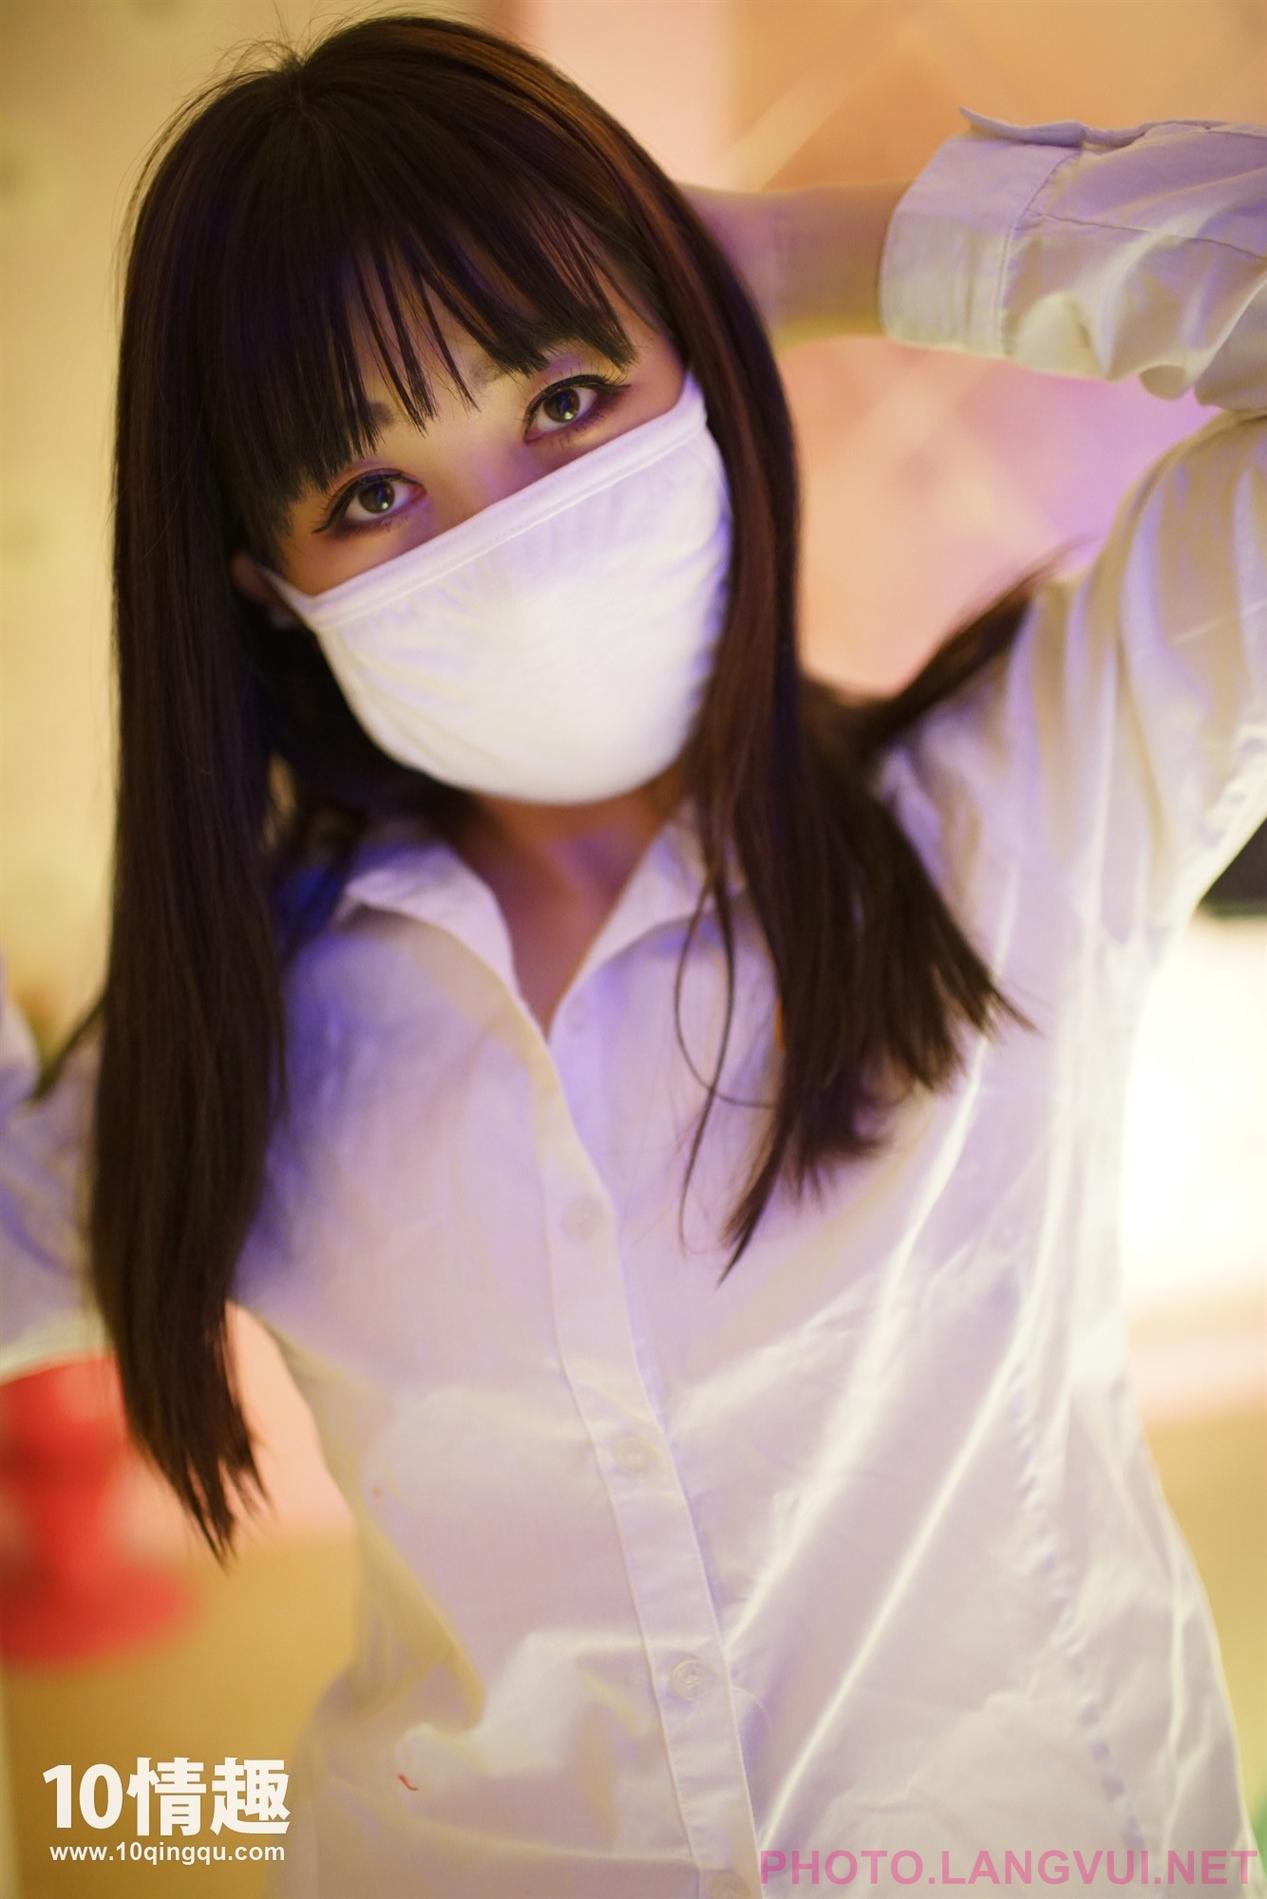 10QingQu Mask Series No 161